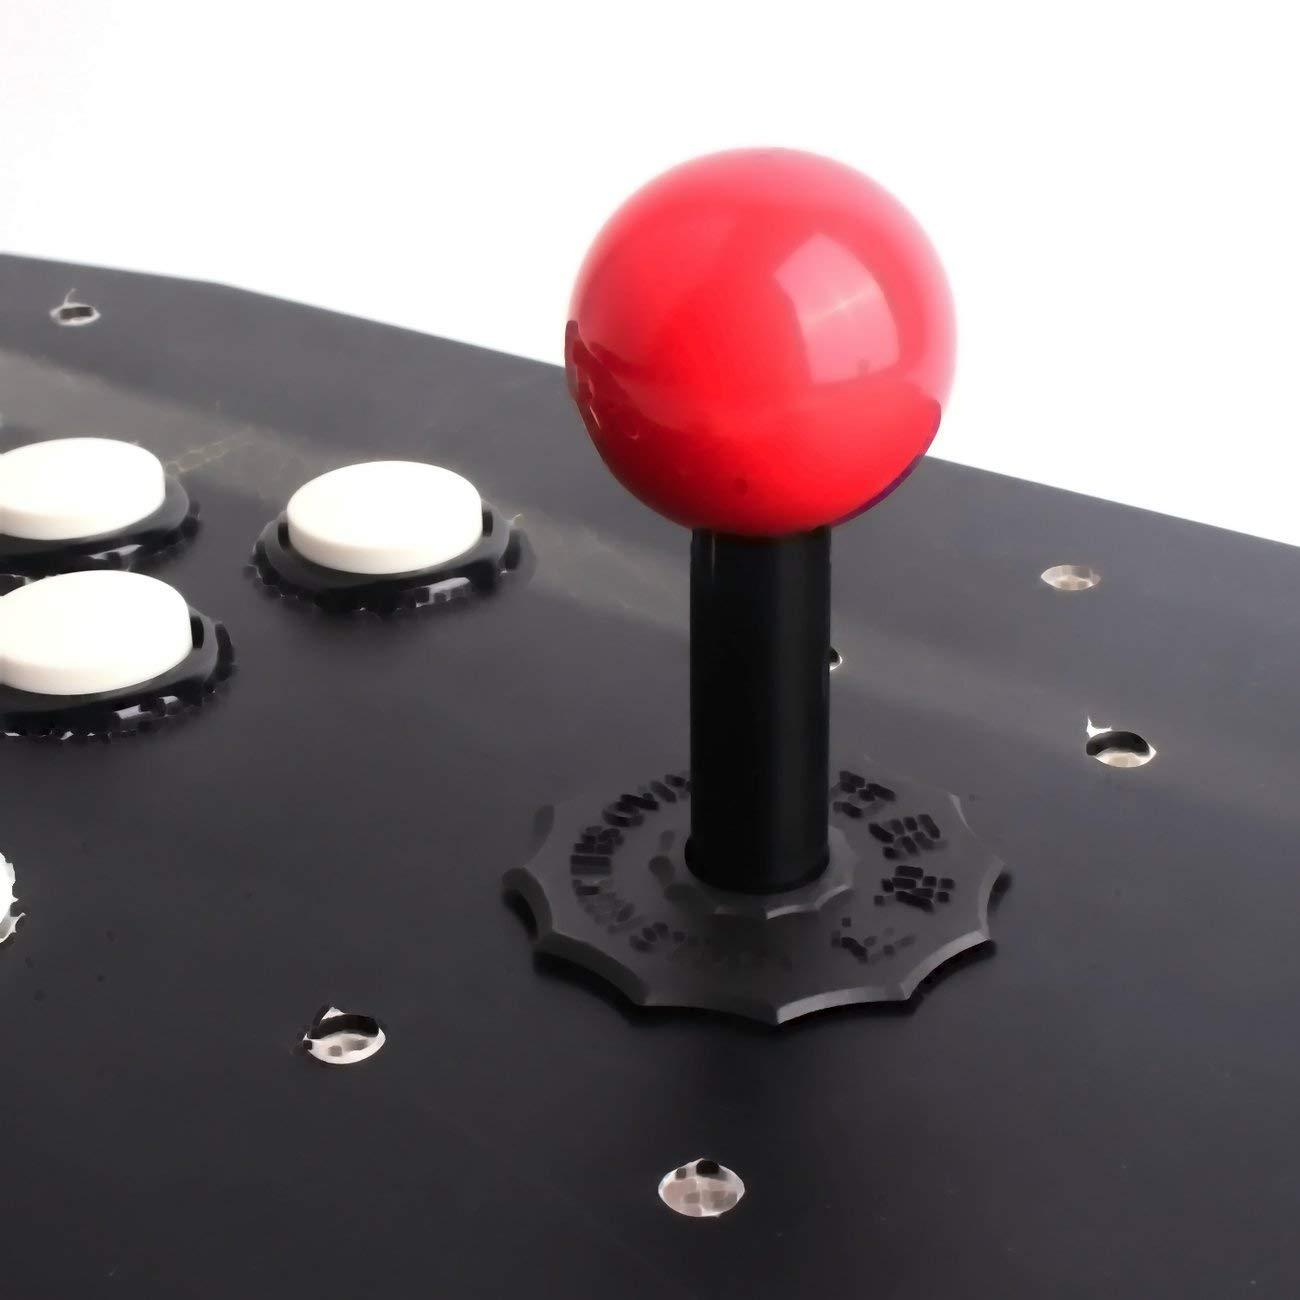 Elviray Dise/ño ergon/ómico Doble Arcade Stick Videojuego Controlador de Joystick Gamepad para PC con Windows Disfrute del Juego Divertido